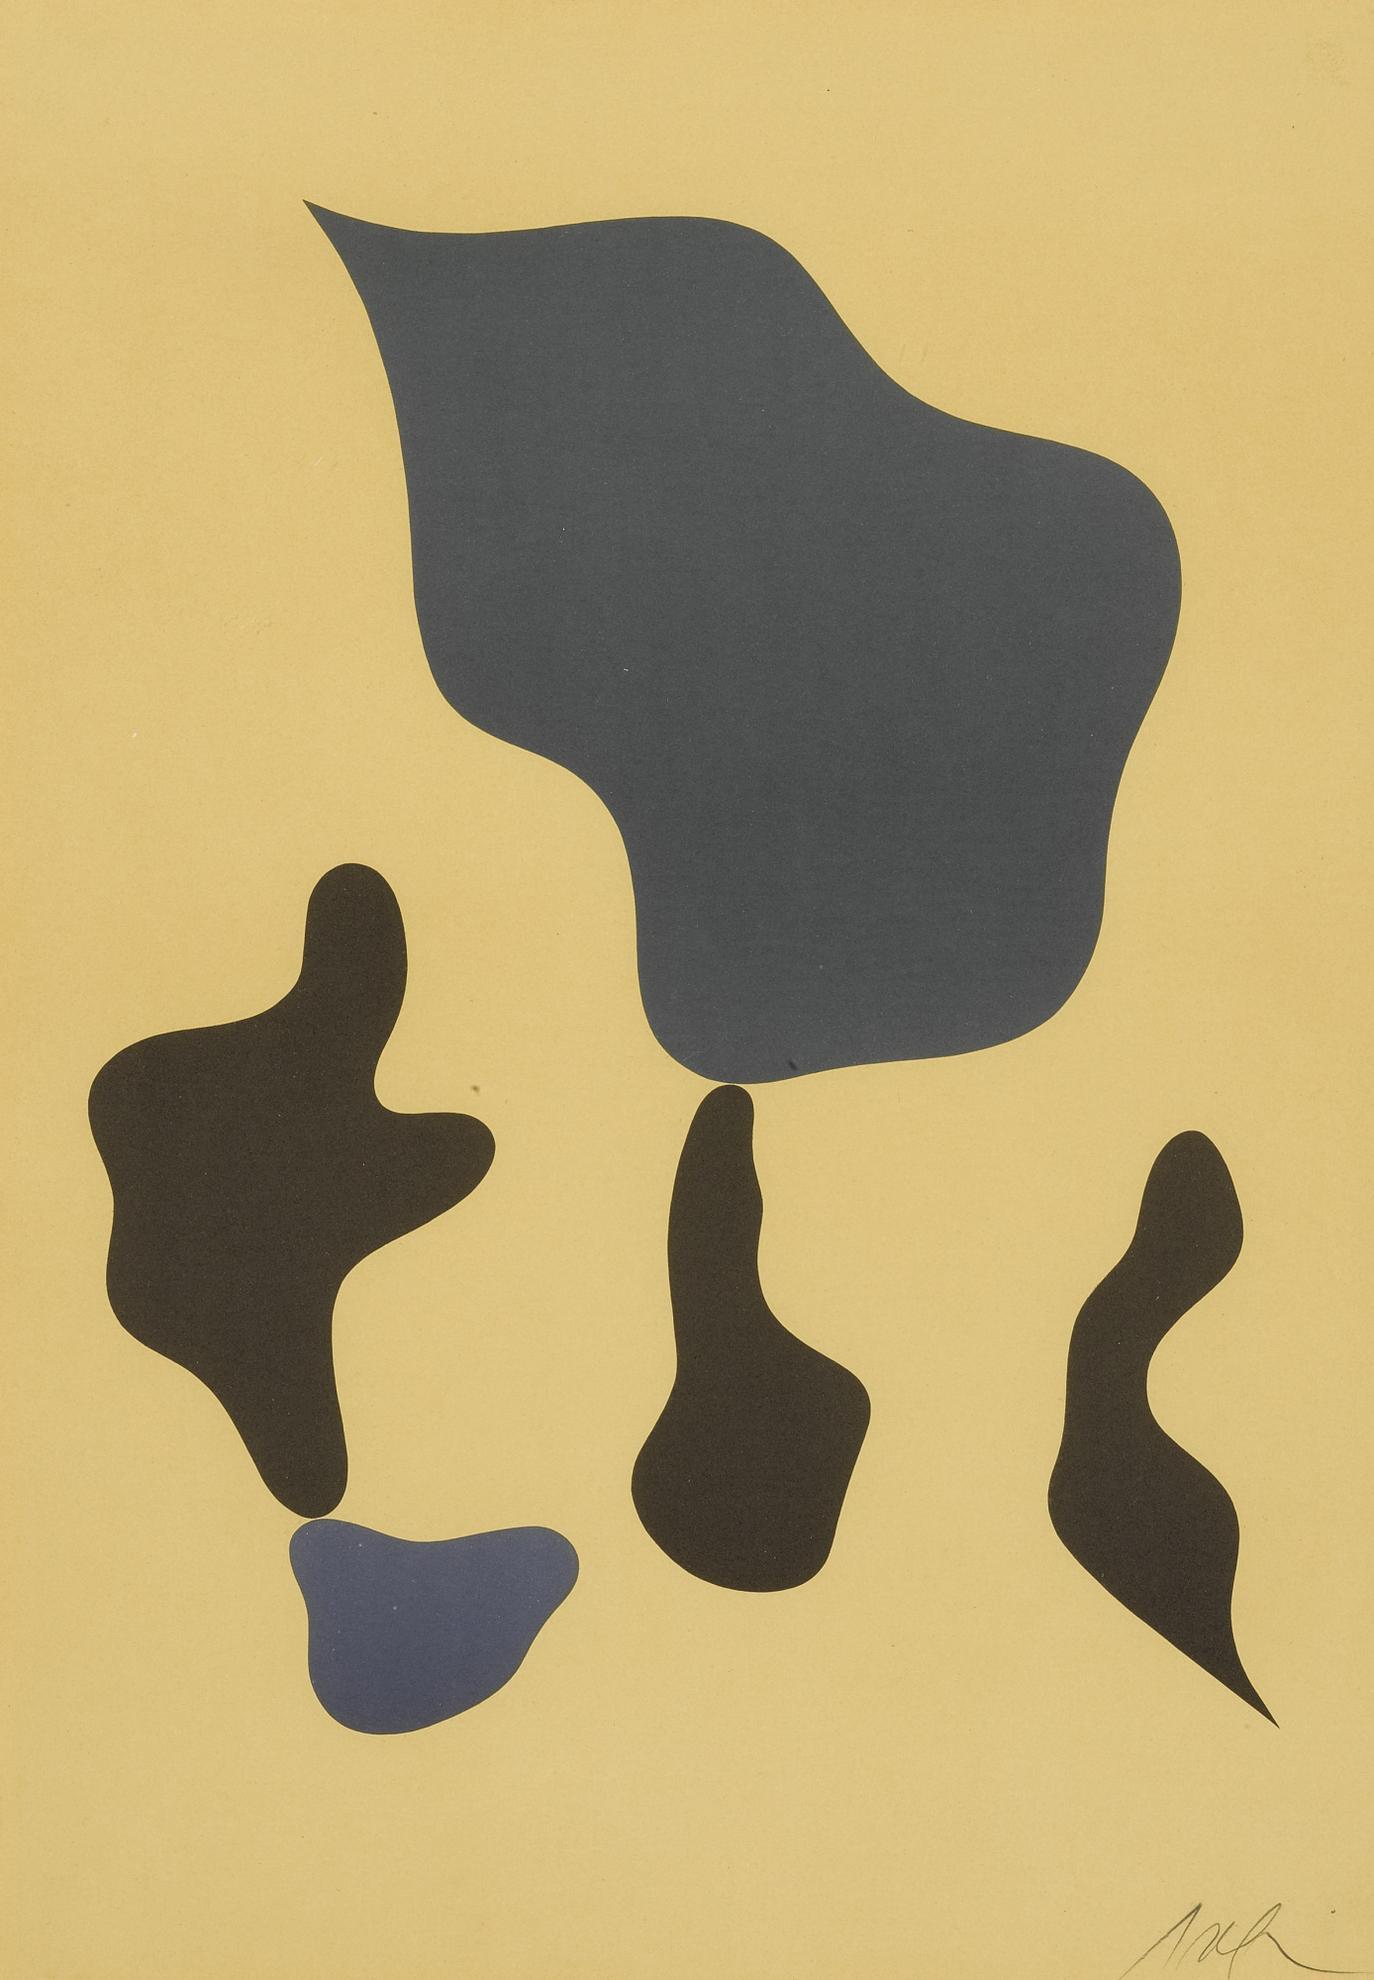 Jean Arp-Composition Mit Funf Formen; And Compositon (Arntz 358 & 362)-1966